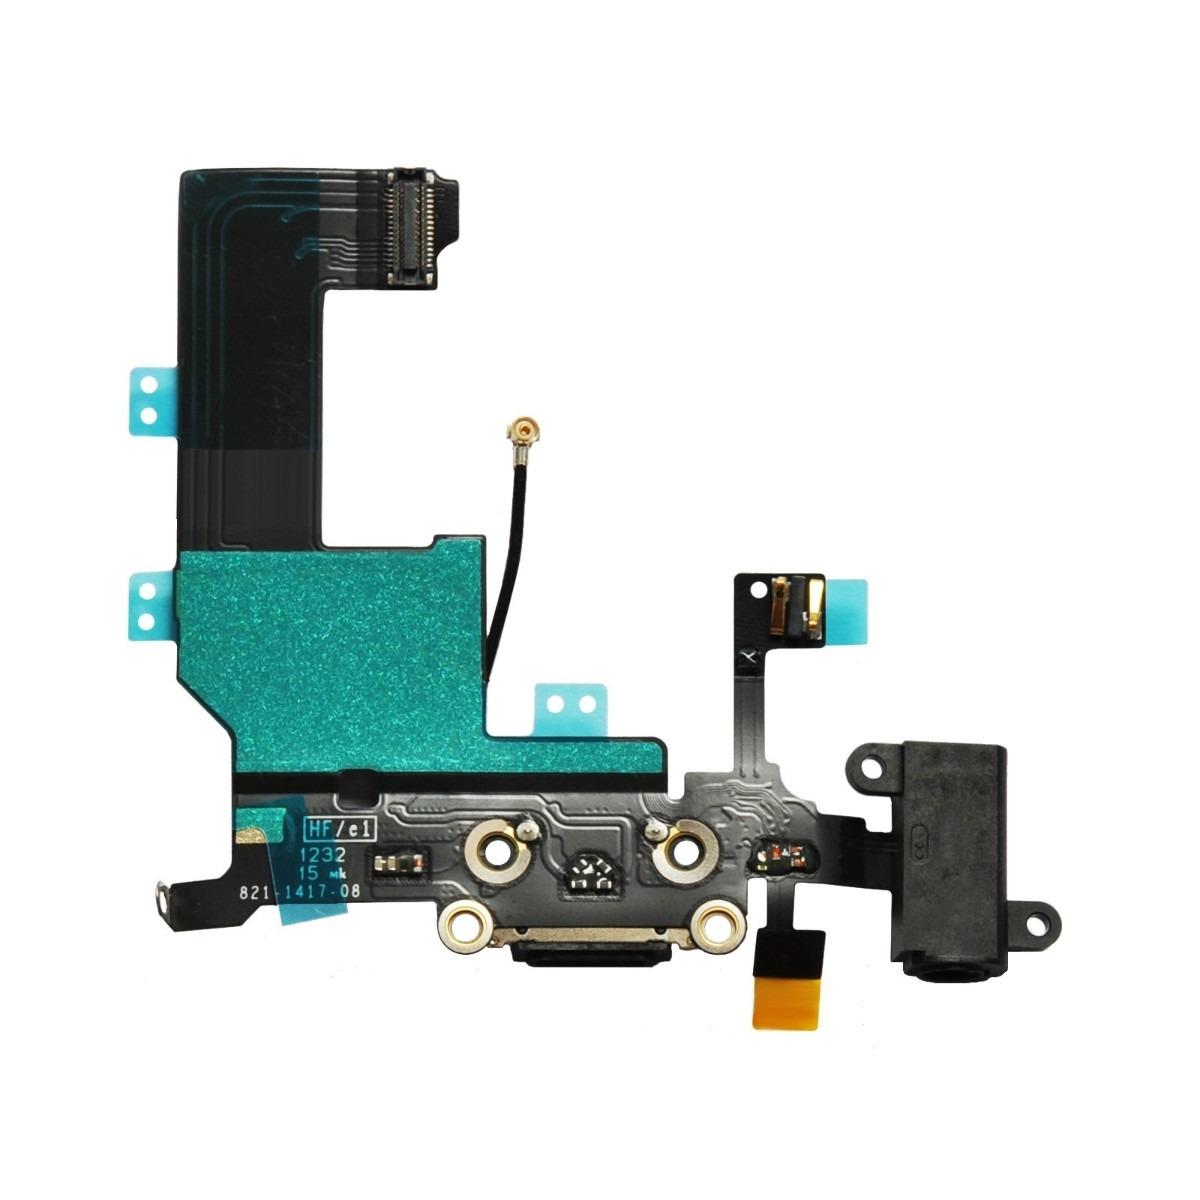 Cabo Flex iPhone 5 / 5s / 5c Dock Conector Carga Usb Fone Antena